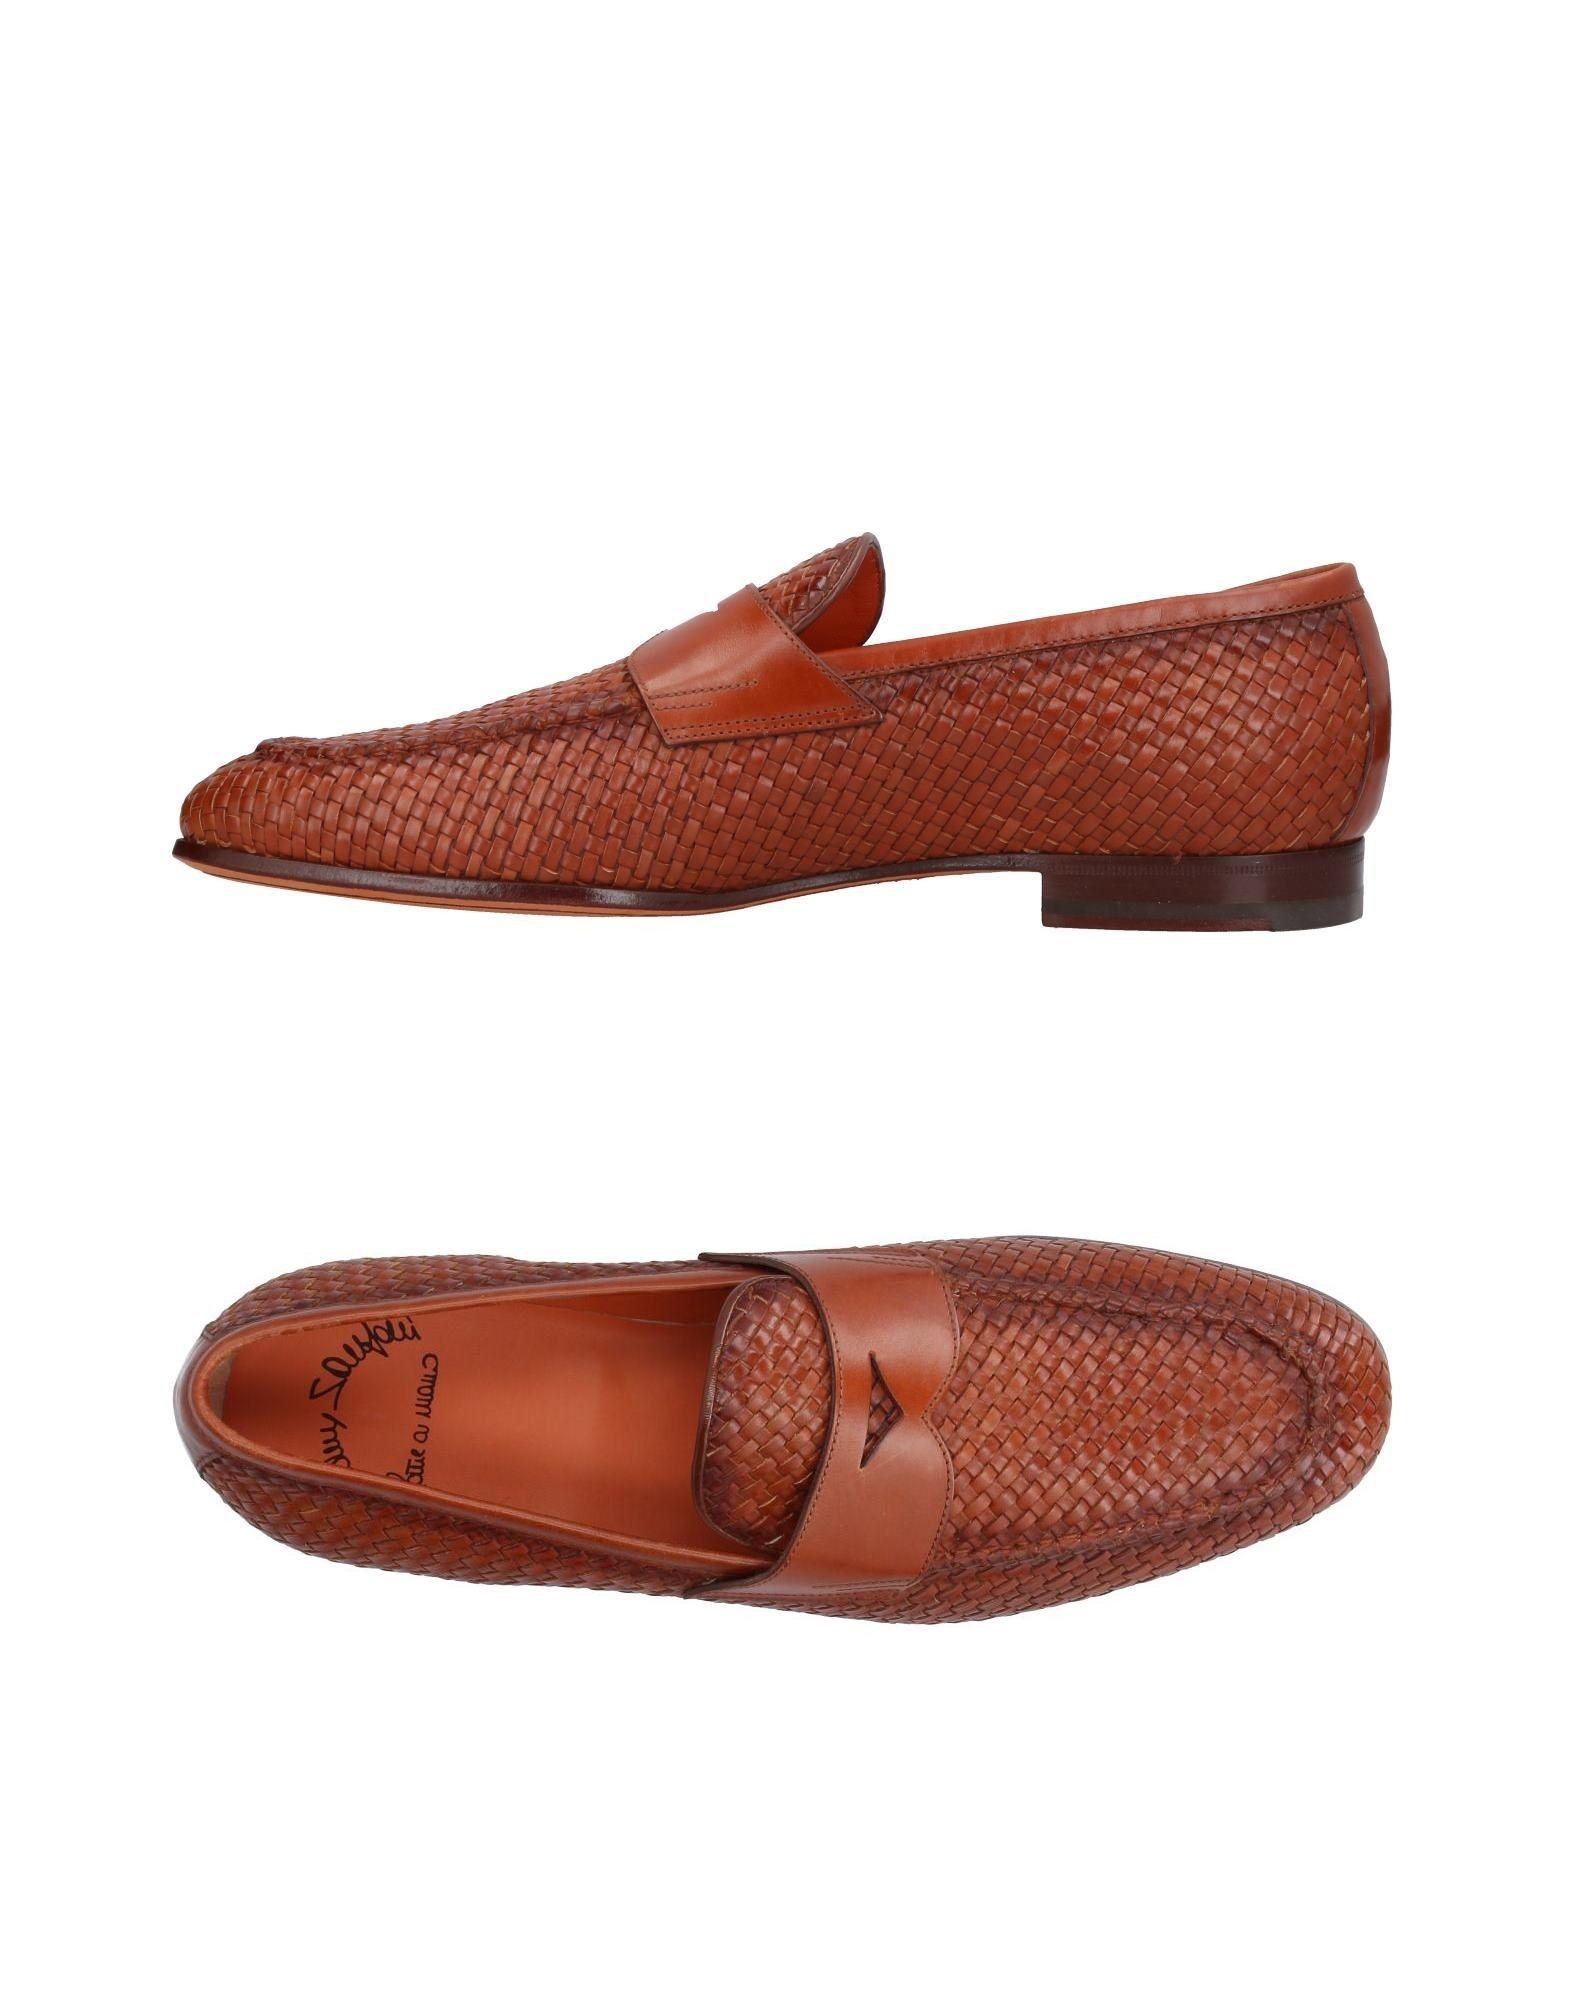 Santoni Mokassins Herren  11369892VJ Gute Qualität beliebte Schuhe